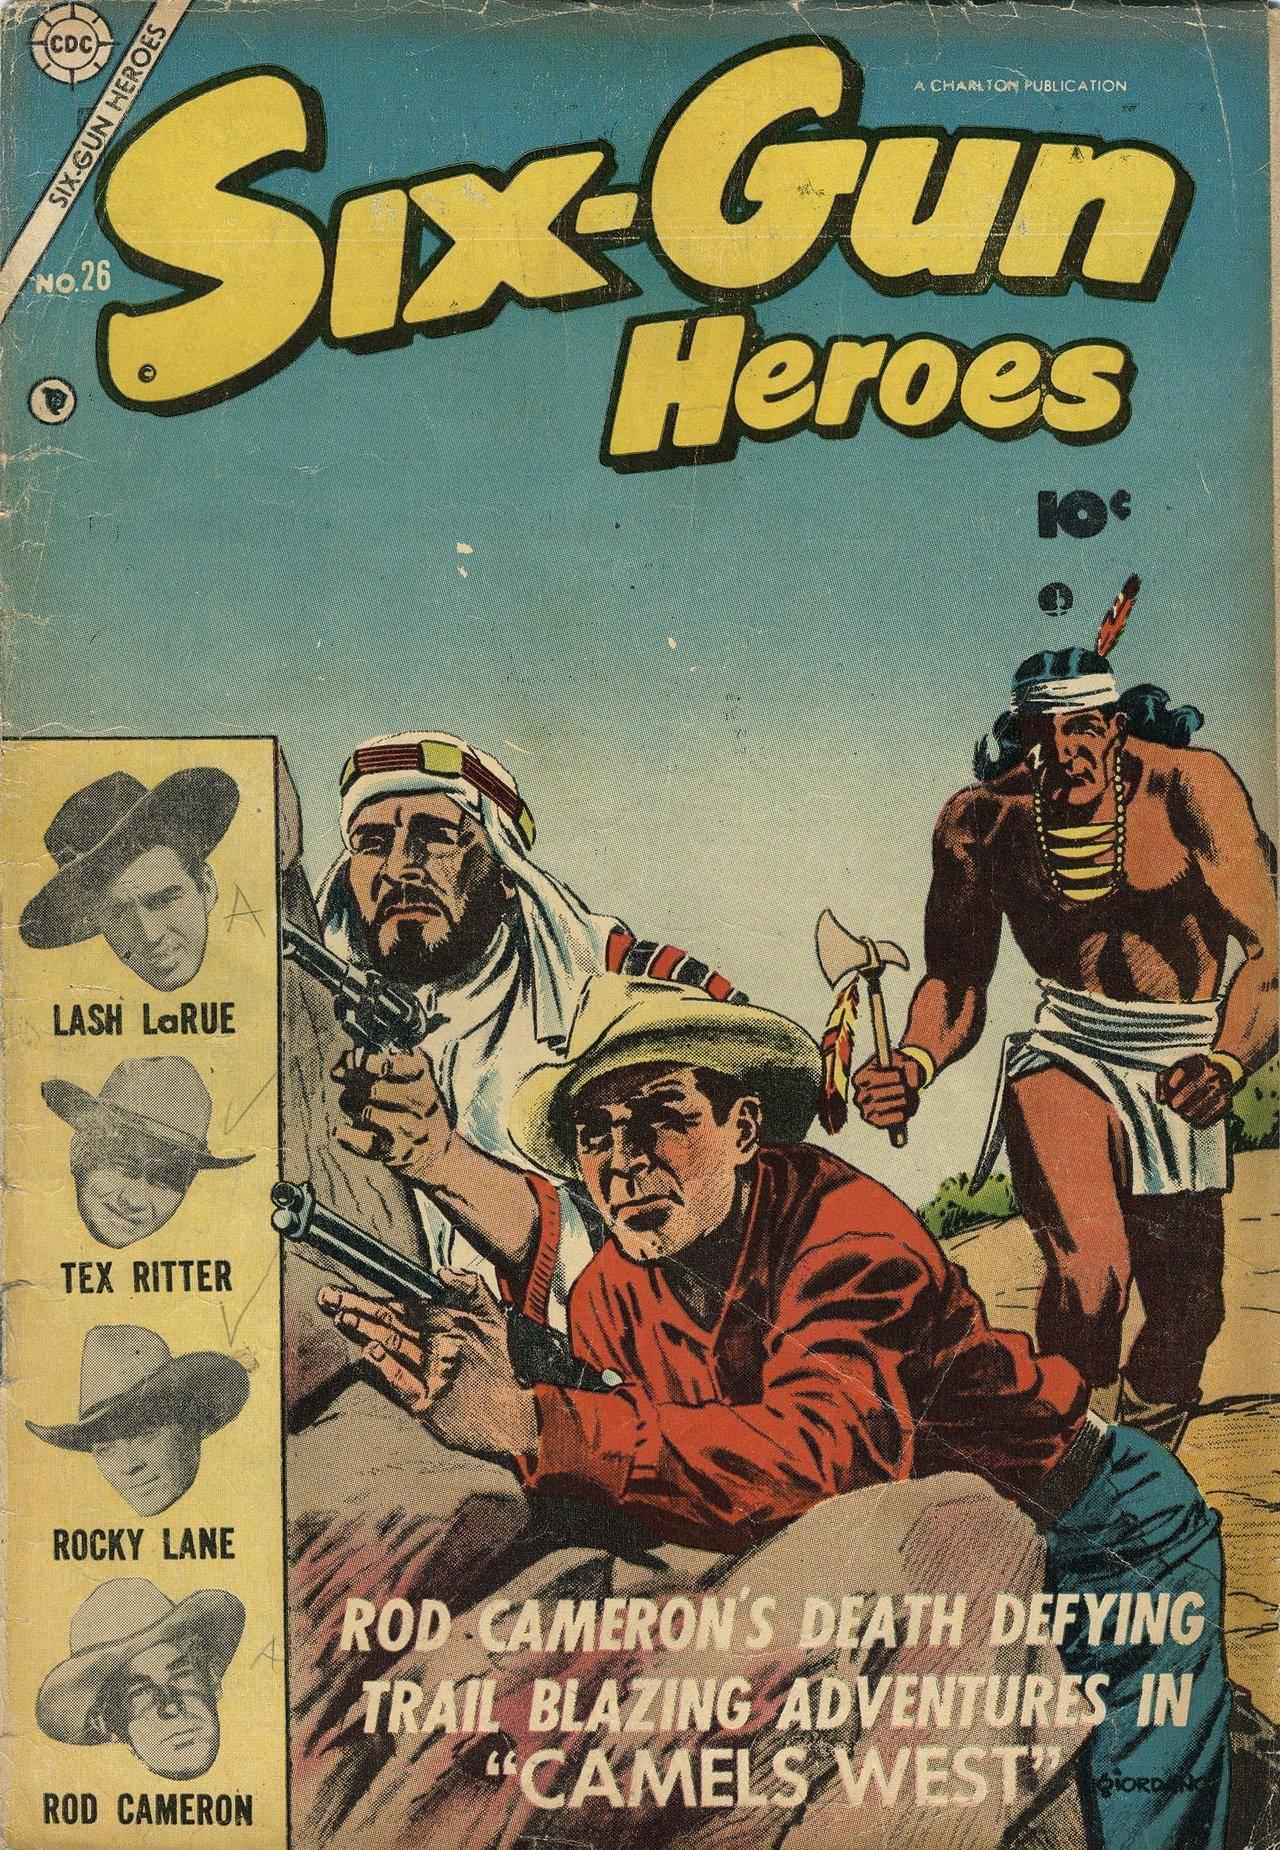 Six-Gun Heroes 026 1954 Charlton c2c